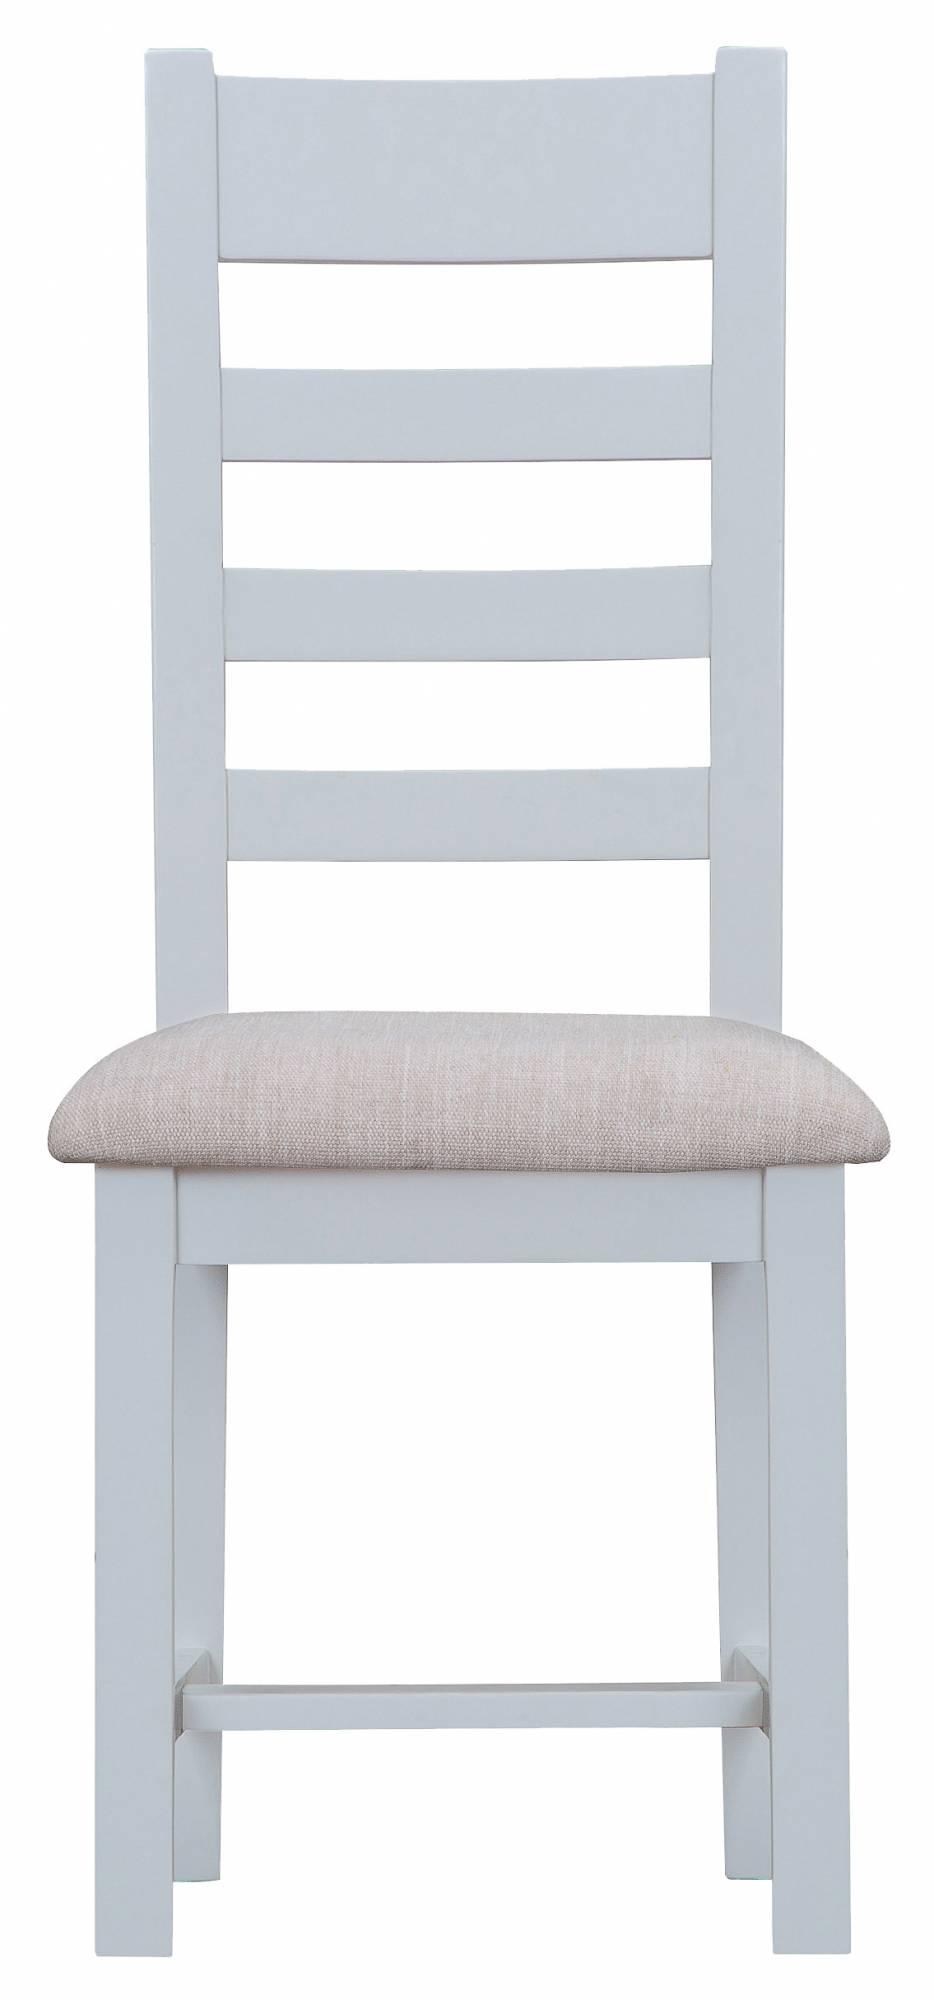 Tetbury Grey Dining Chair With Ladder Back u0026 Fabric Seat. Loading zoom  sc 1 st  Oldrids & Tetbury Grey Ladder Back Dining Chairs | Oldrids u0026 Downtown